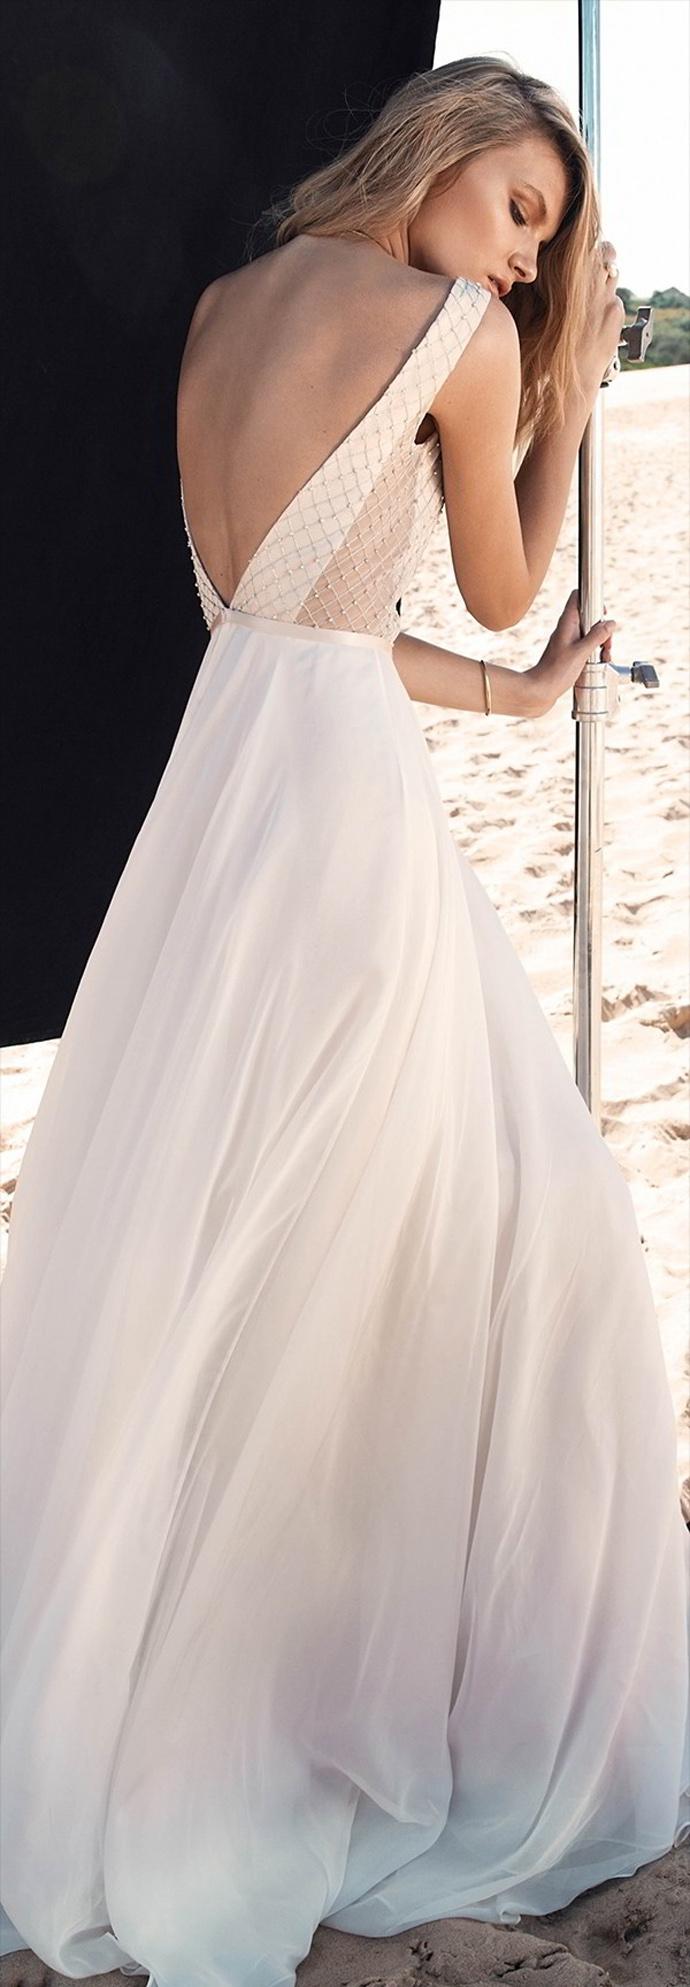 One-Day-Bridal-2016 nunta in gradina (12)